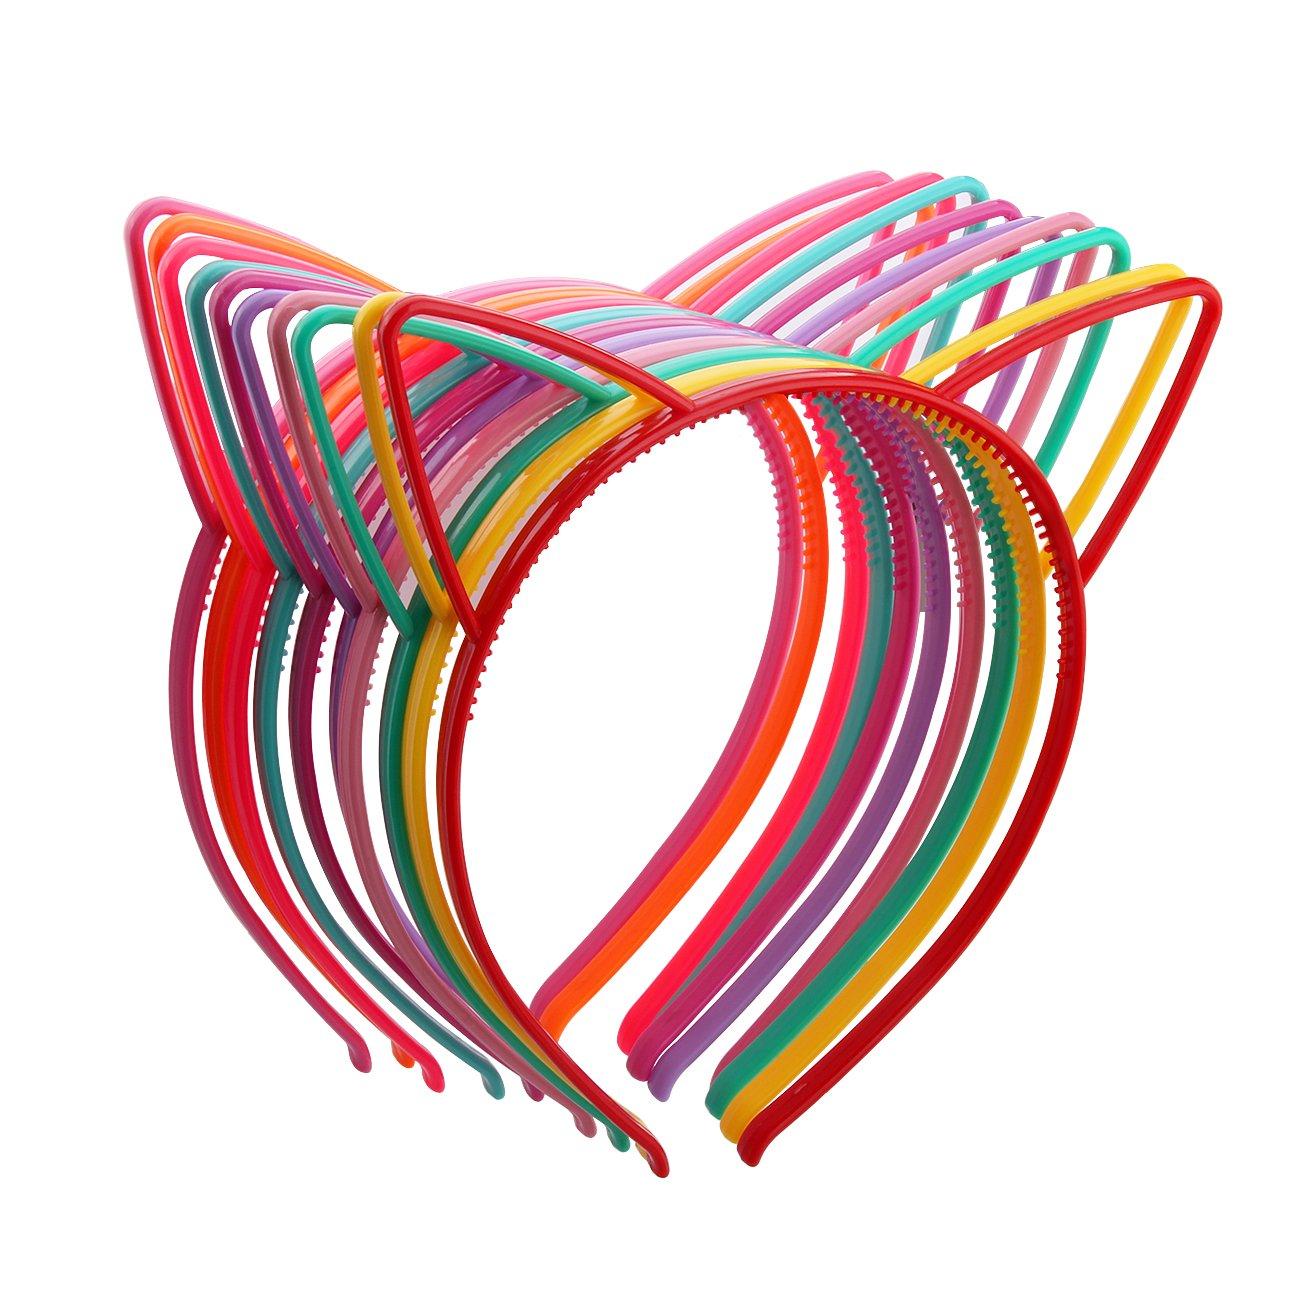 Candygirl Girl's Plastic Headbands Tiara Bunny Cat Bow Hairbands (GLOW IN DARK) glow-cat